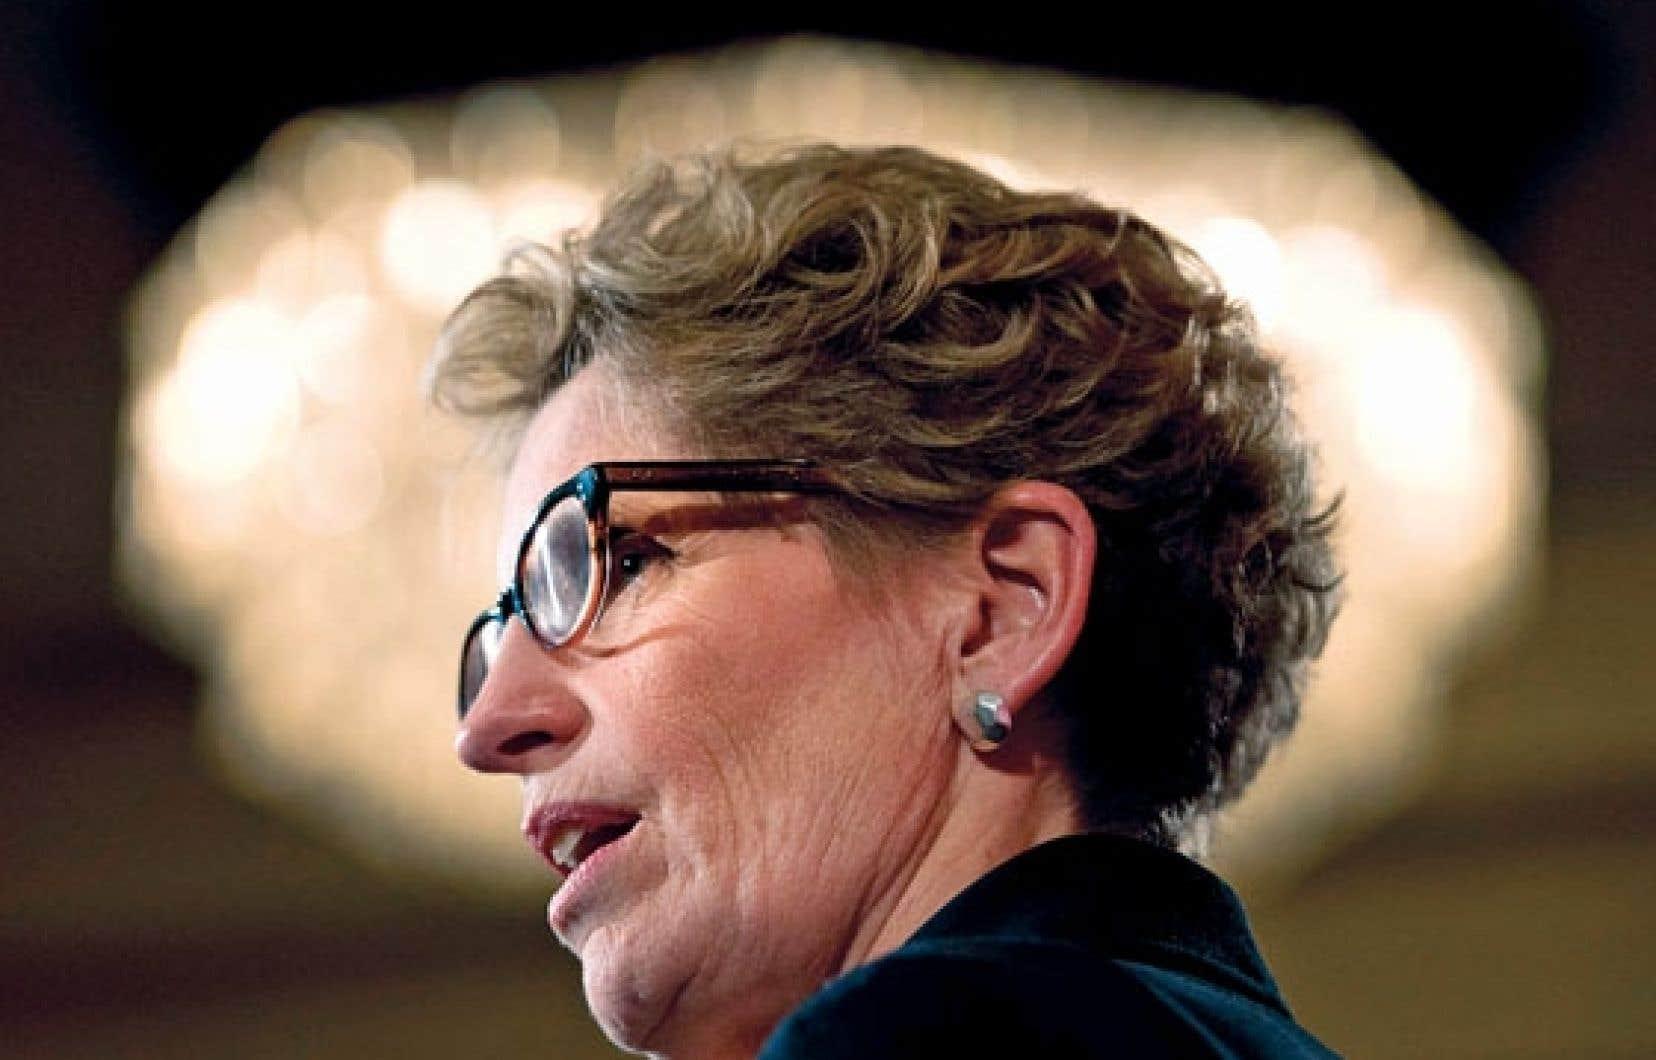 Kathleen Wynne a été élue chef du Parti libéral de l'Ontario samedi.